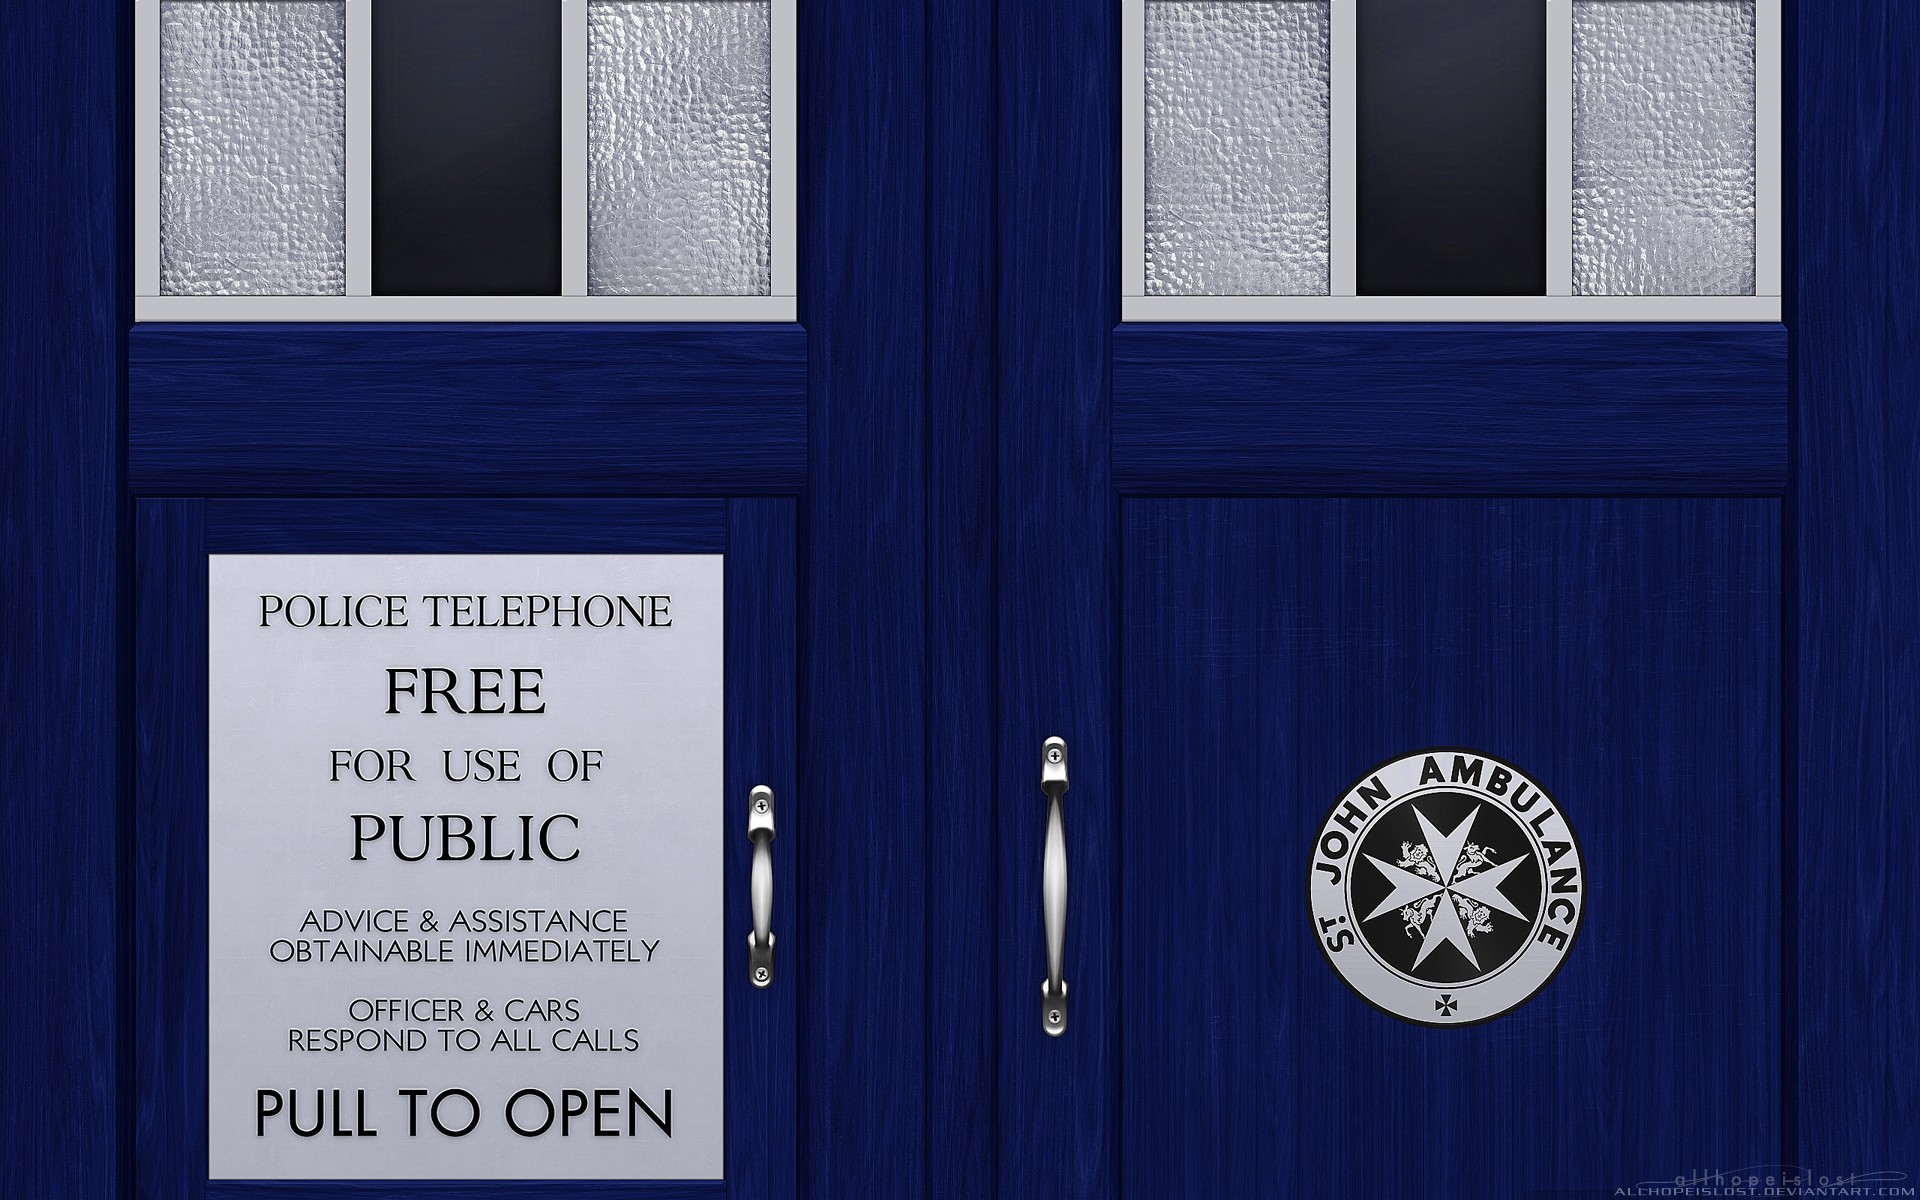 Doctor Who Tardis Wallpaper Iphone 32 1120×600@2x